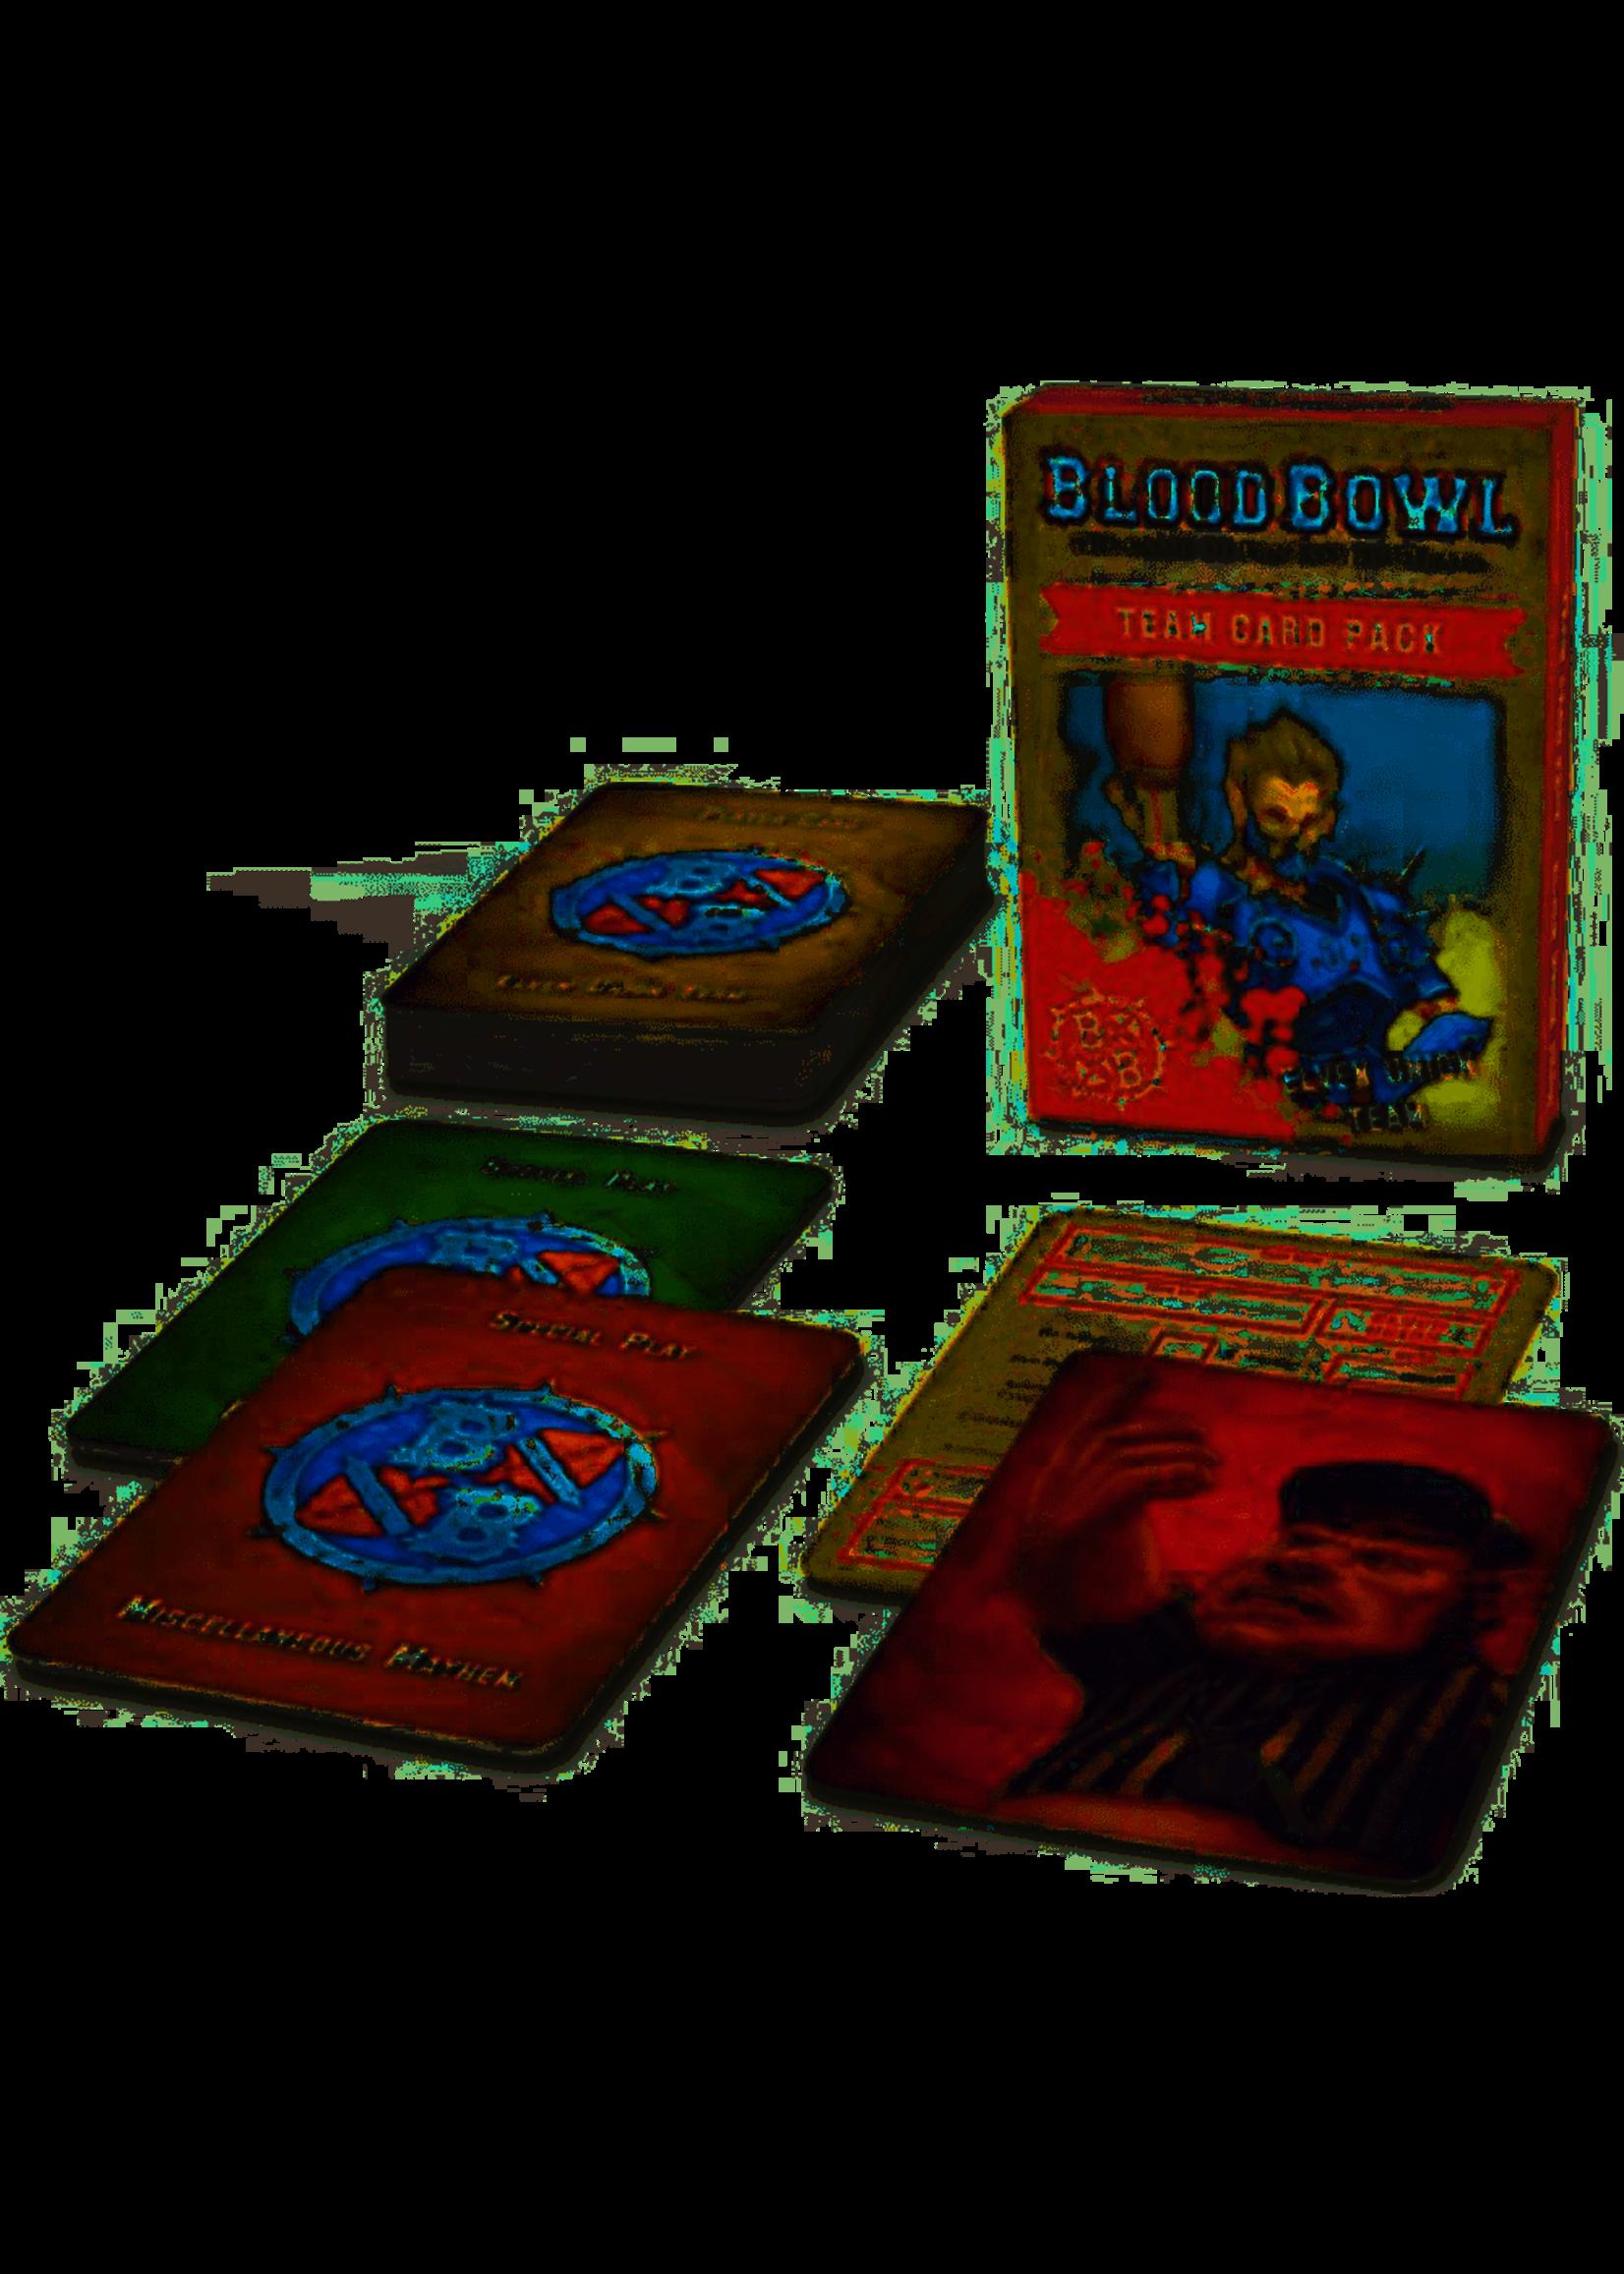 Blood Bowl: Elven Union Team Card Pack